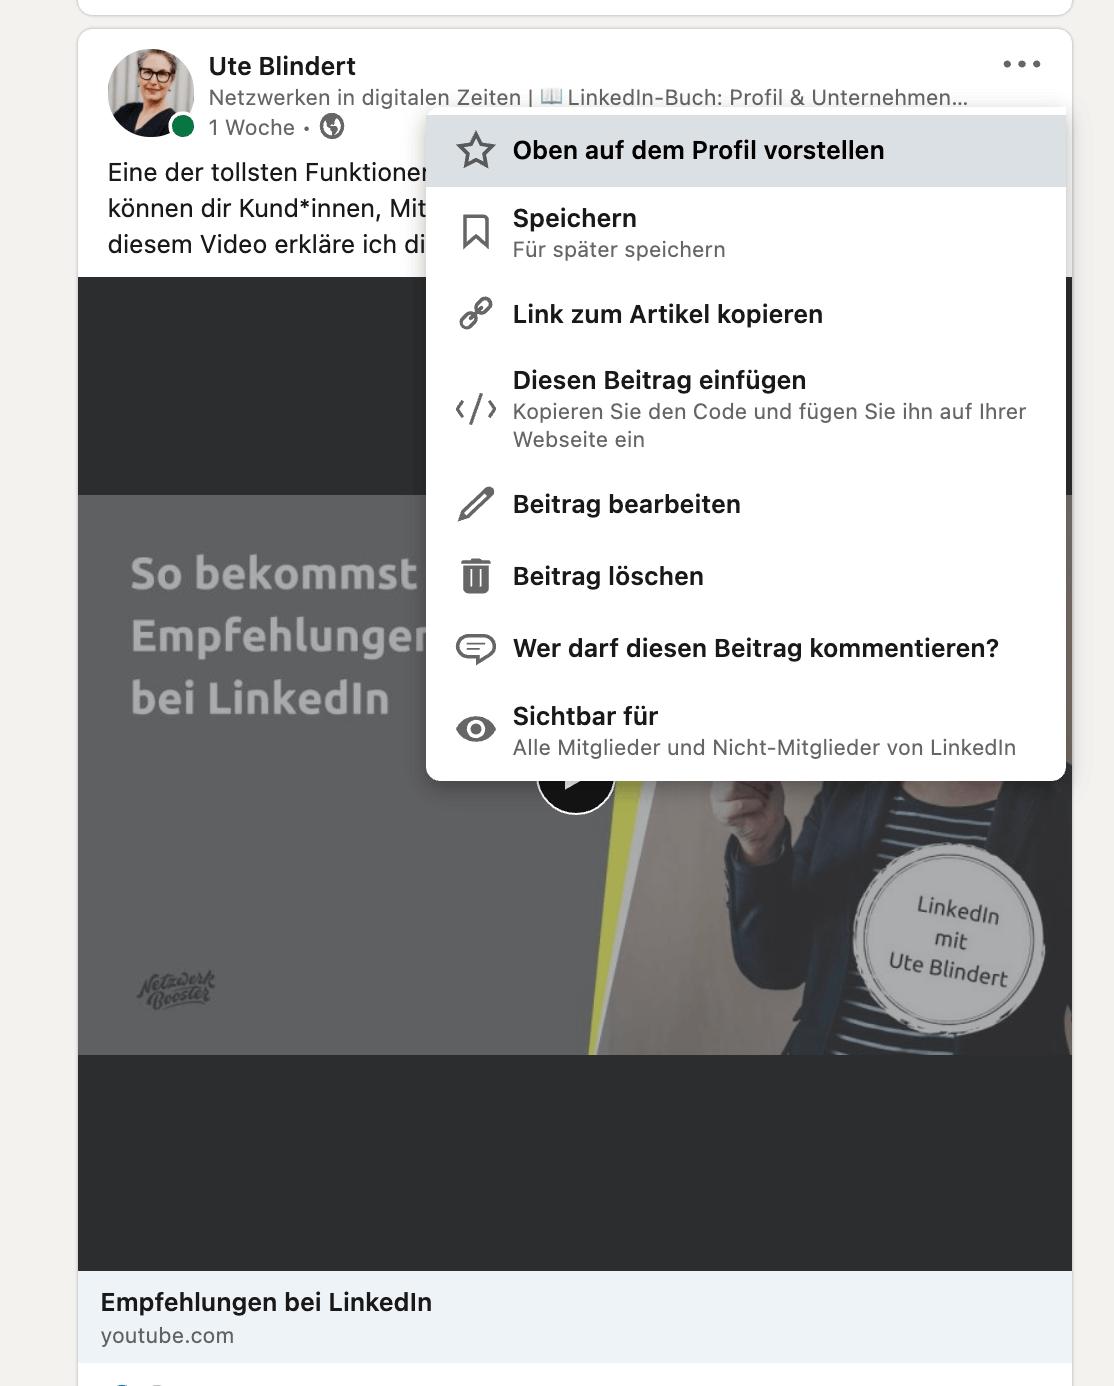 Beitrag im Fokus bei LinkedIn